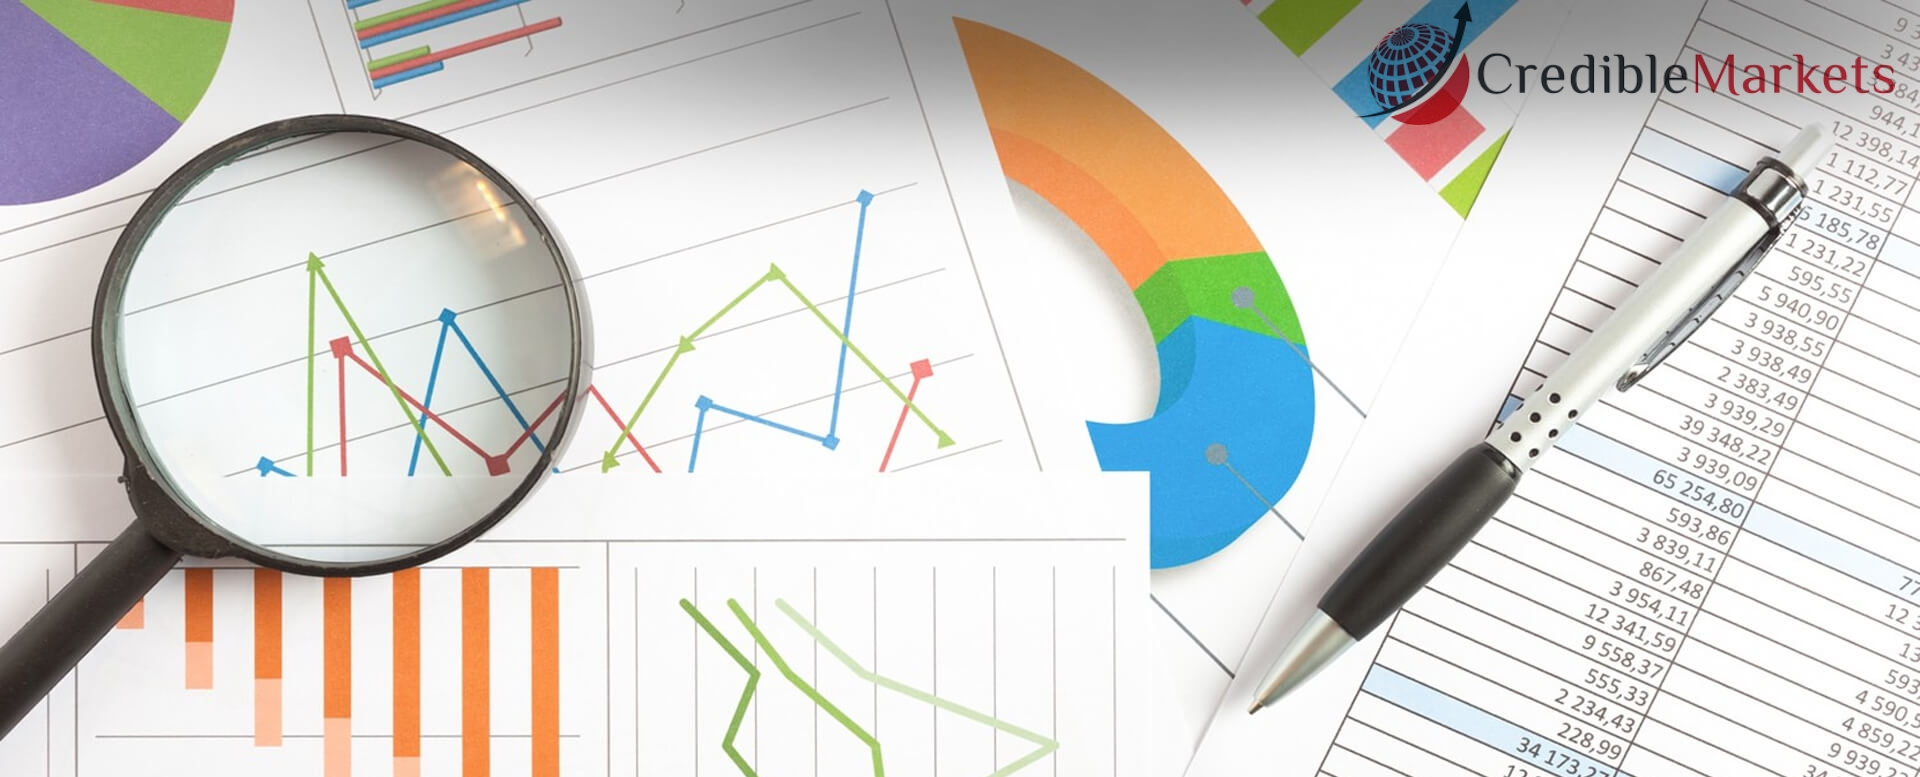 Icewine Market Report 2020 Current Trends, Future Aspect Analysis By Top Competitors: Inniskillin, Pillitteri Estates, Pelee Island, Peller Estates, Kittling Ridge, Reif Estate Winery – Canaan Mountain Herald photo